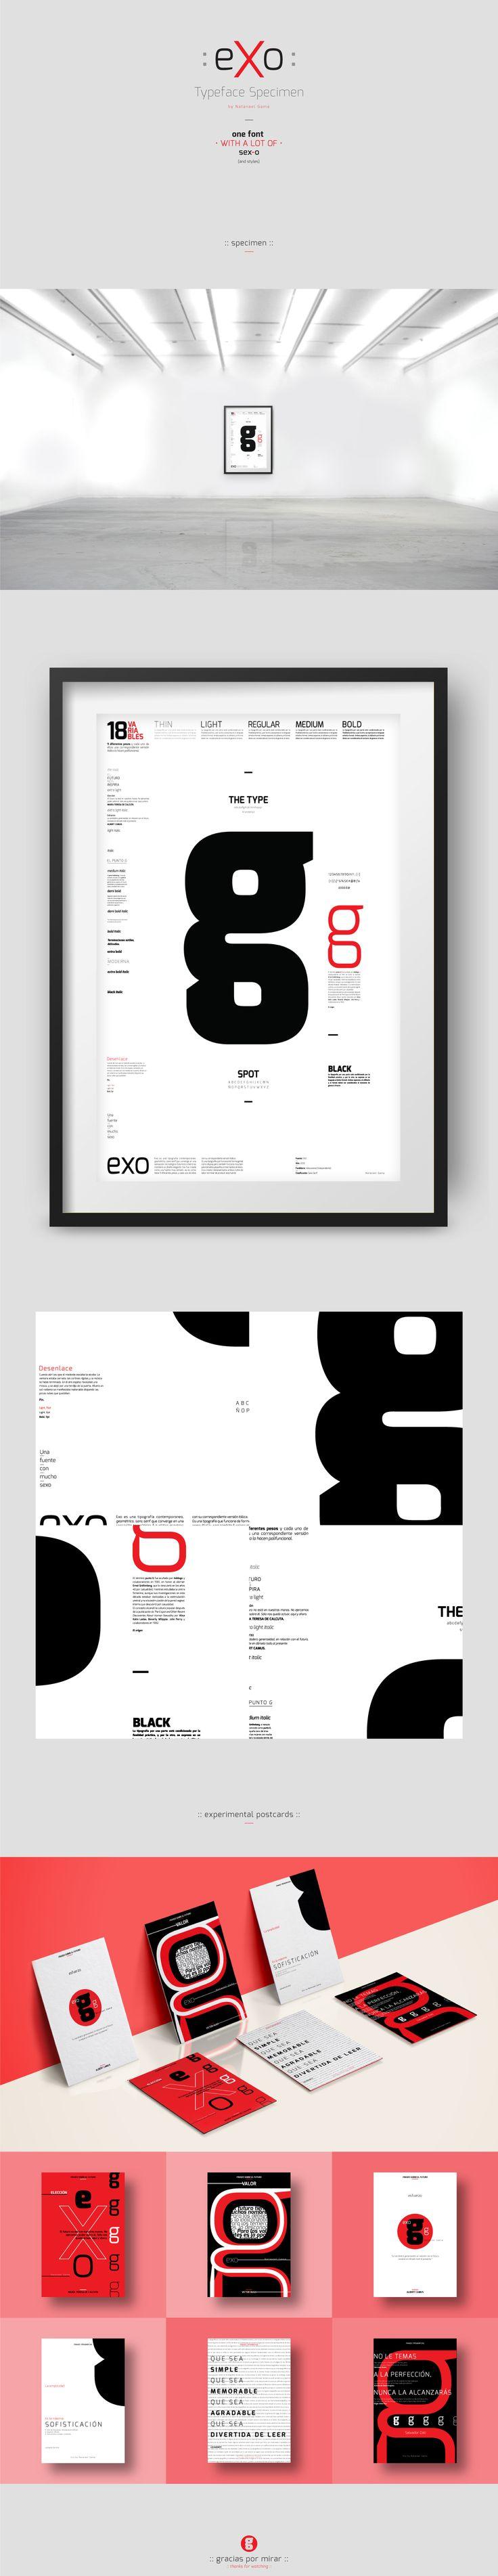 :: e x o :: Espécimen tipográfico | Typeface specimen on Behance